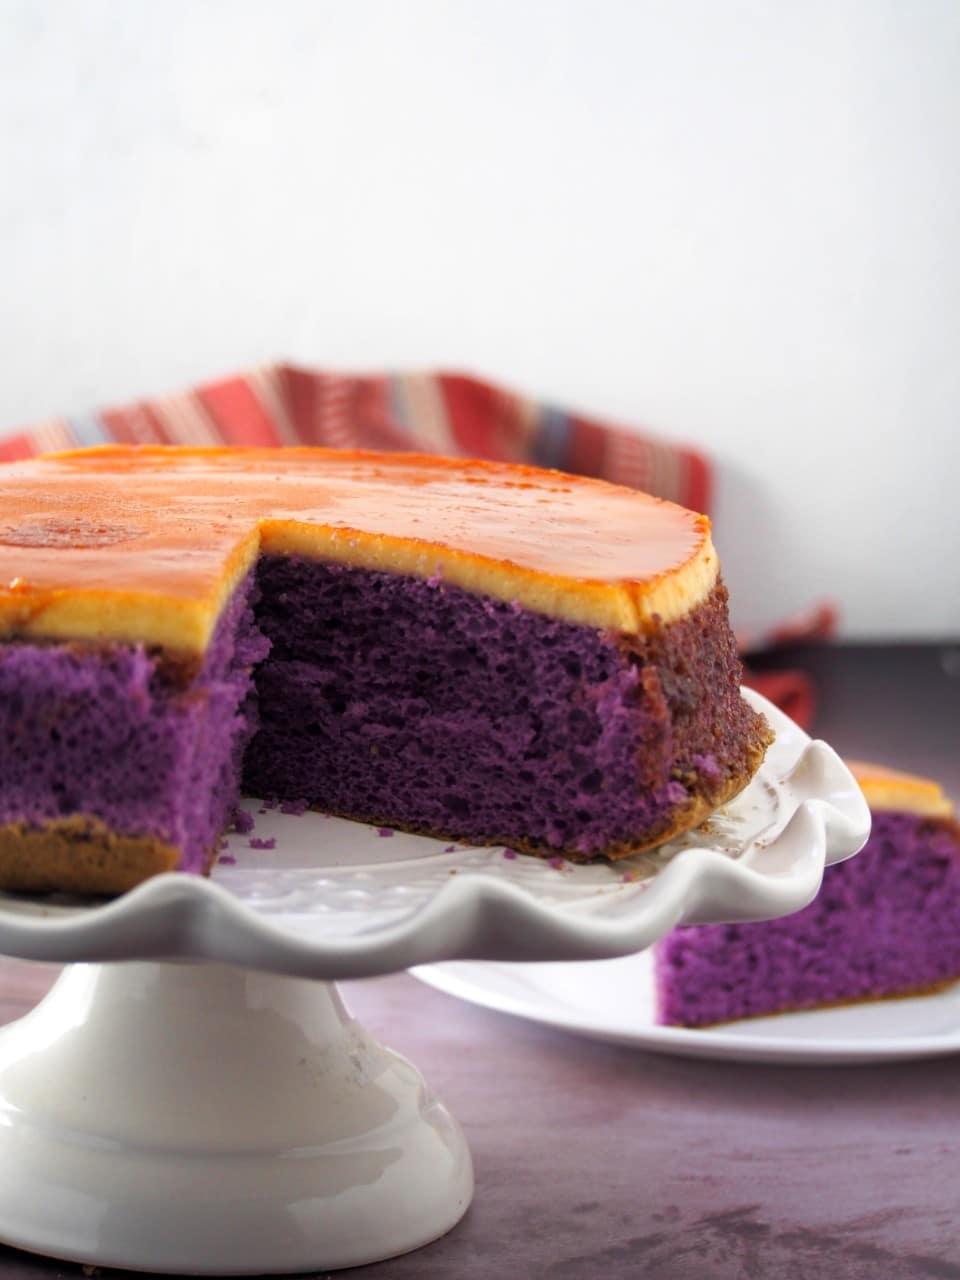 Sliced Ube flan cake on a cake stand.